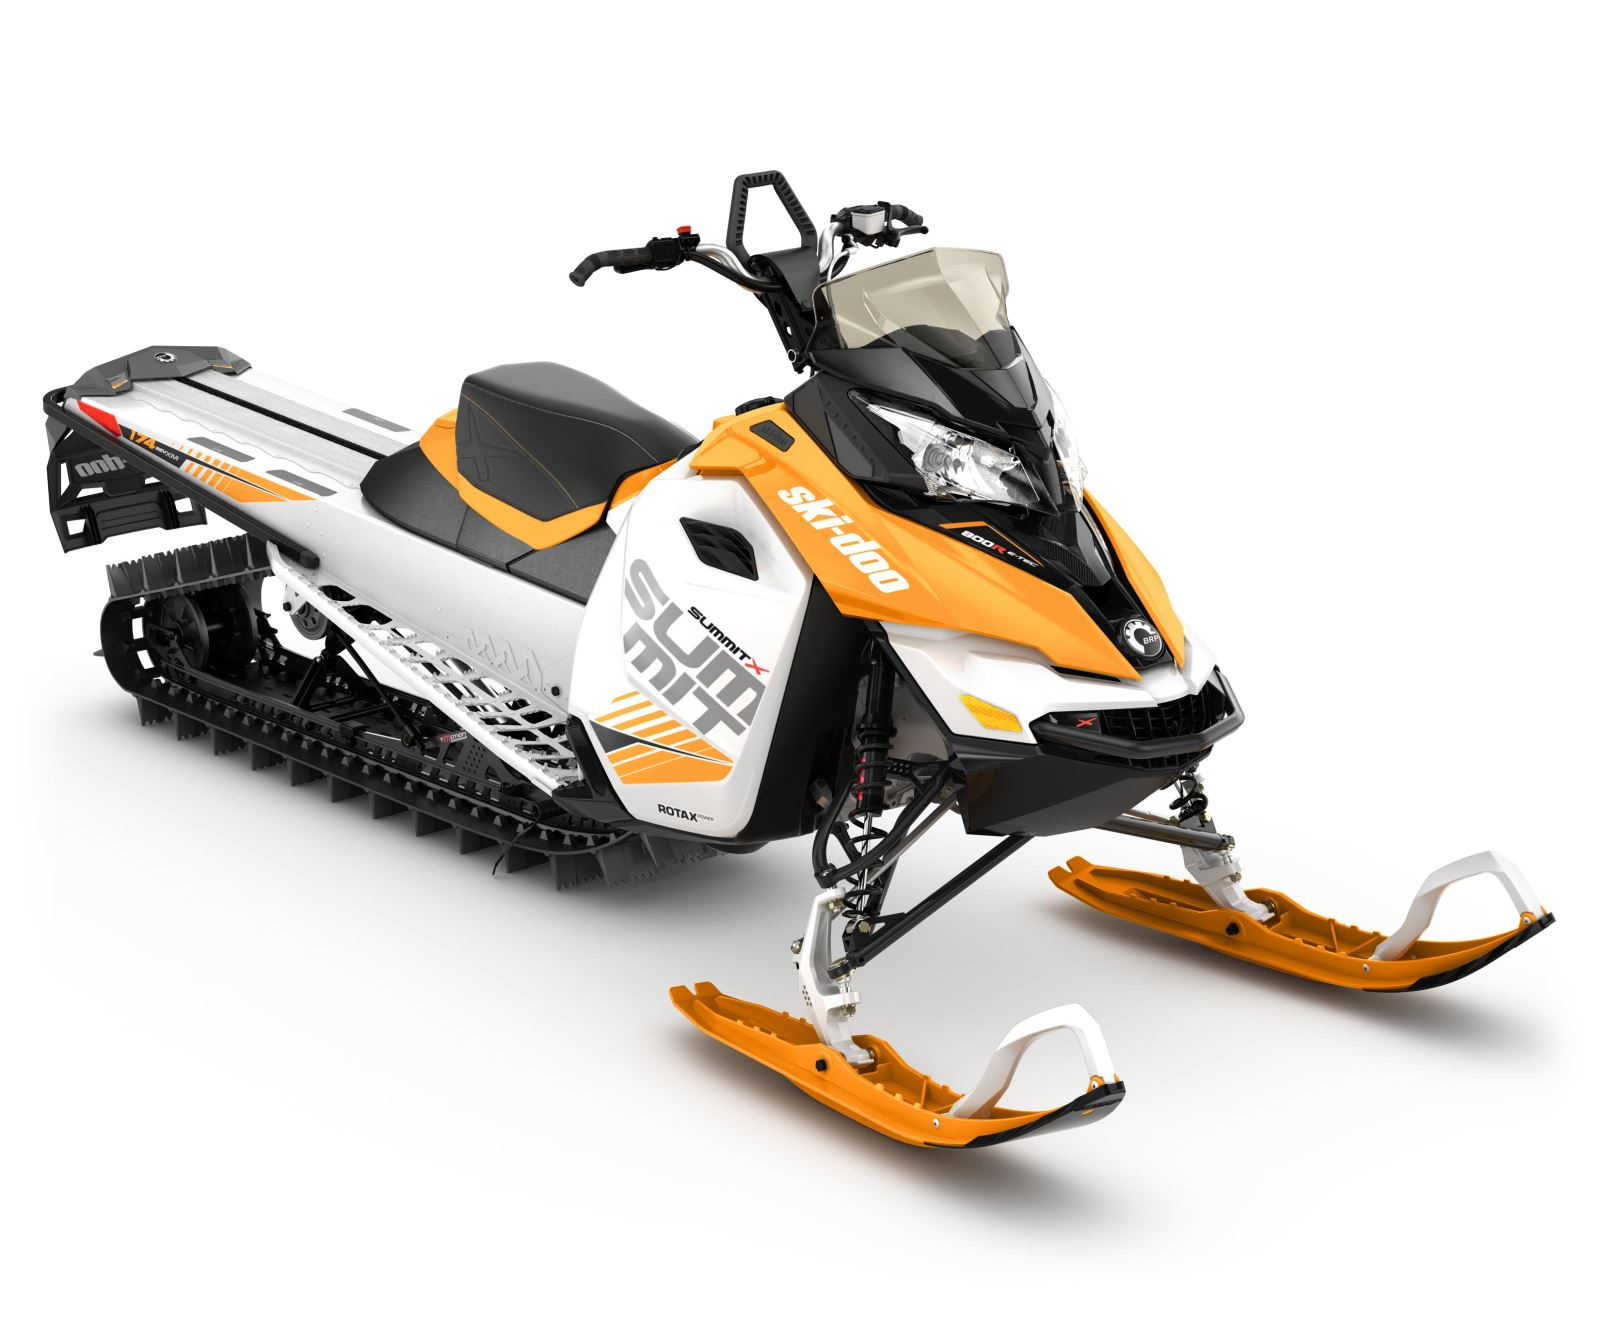 07 Ski-doo Summit 800